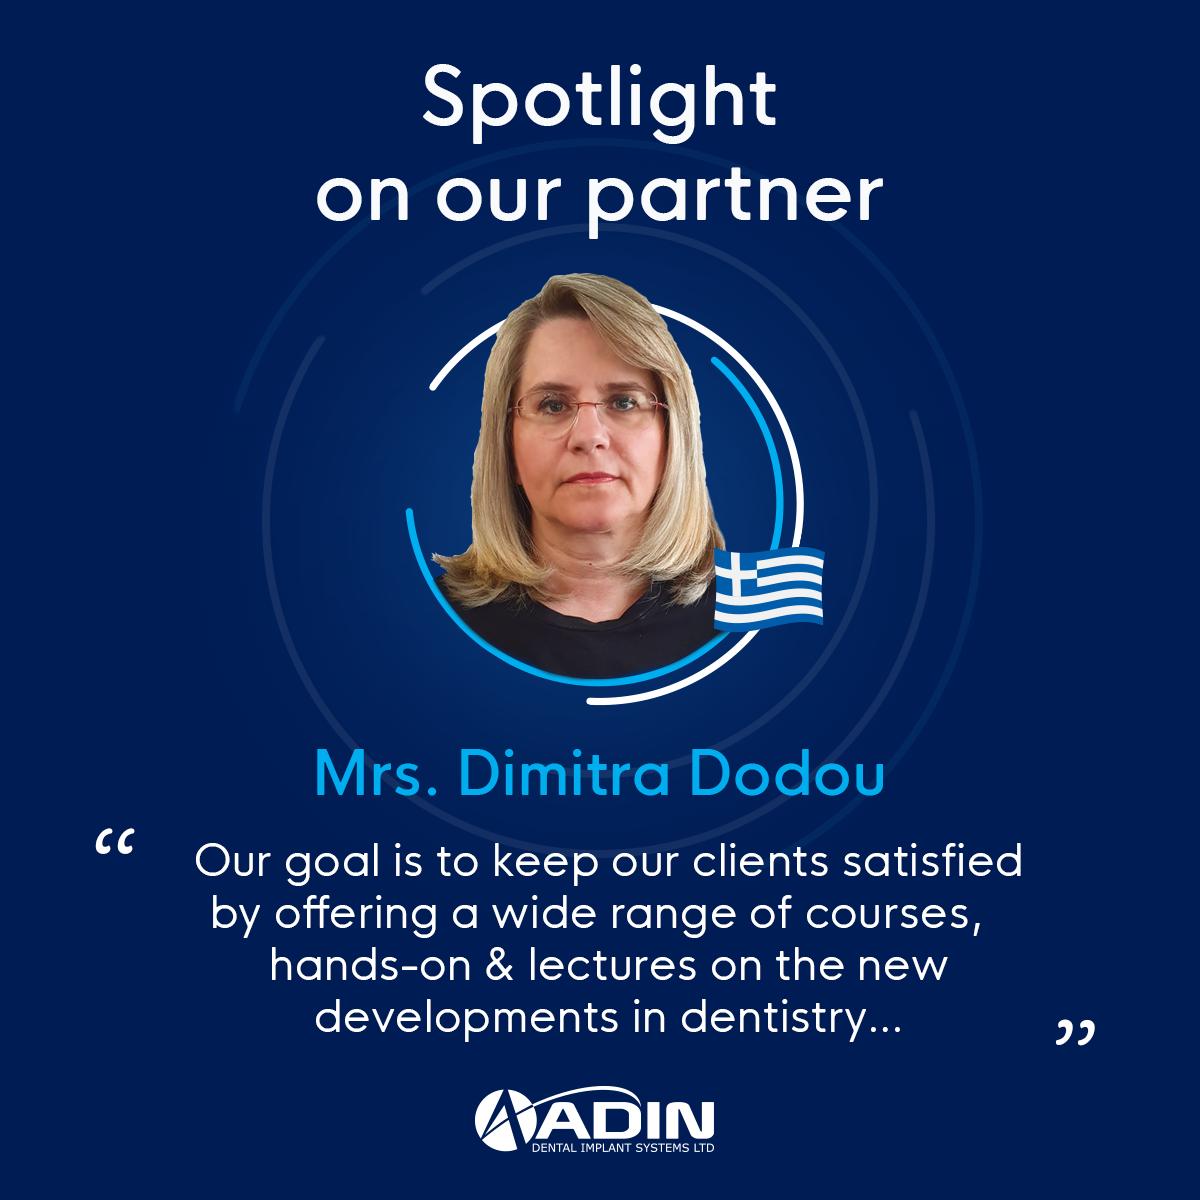 Spotlight on our partner Mrs. Dimitra Dodou, Greece